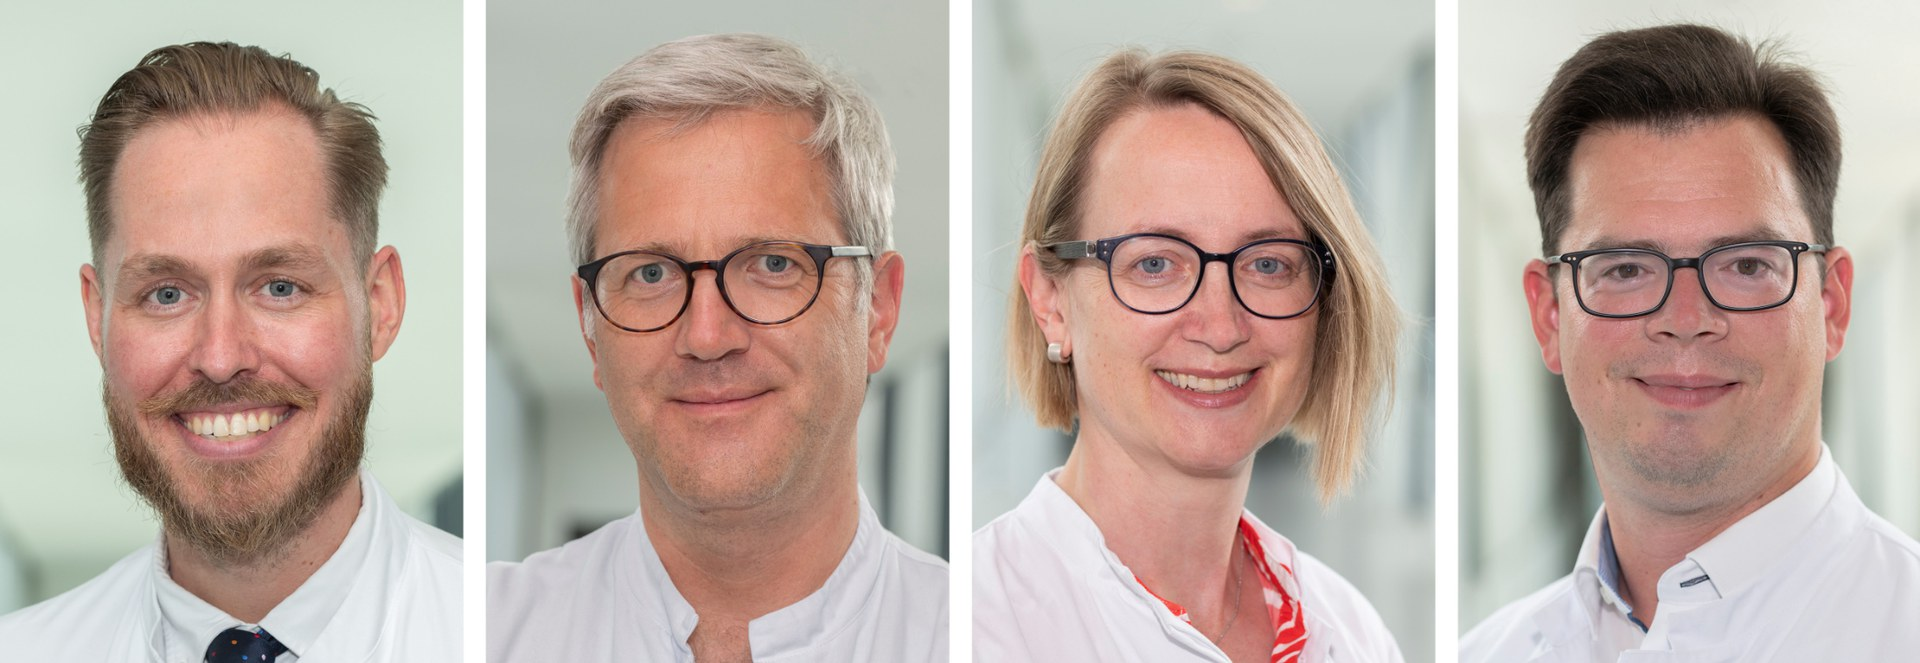 Patientenkolloquium des Universitätsklinikums Bonn zu rheumatologische Erkrankungen am 19. August: